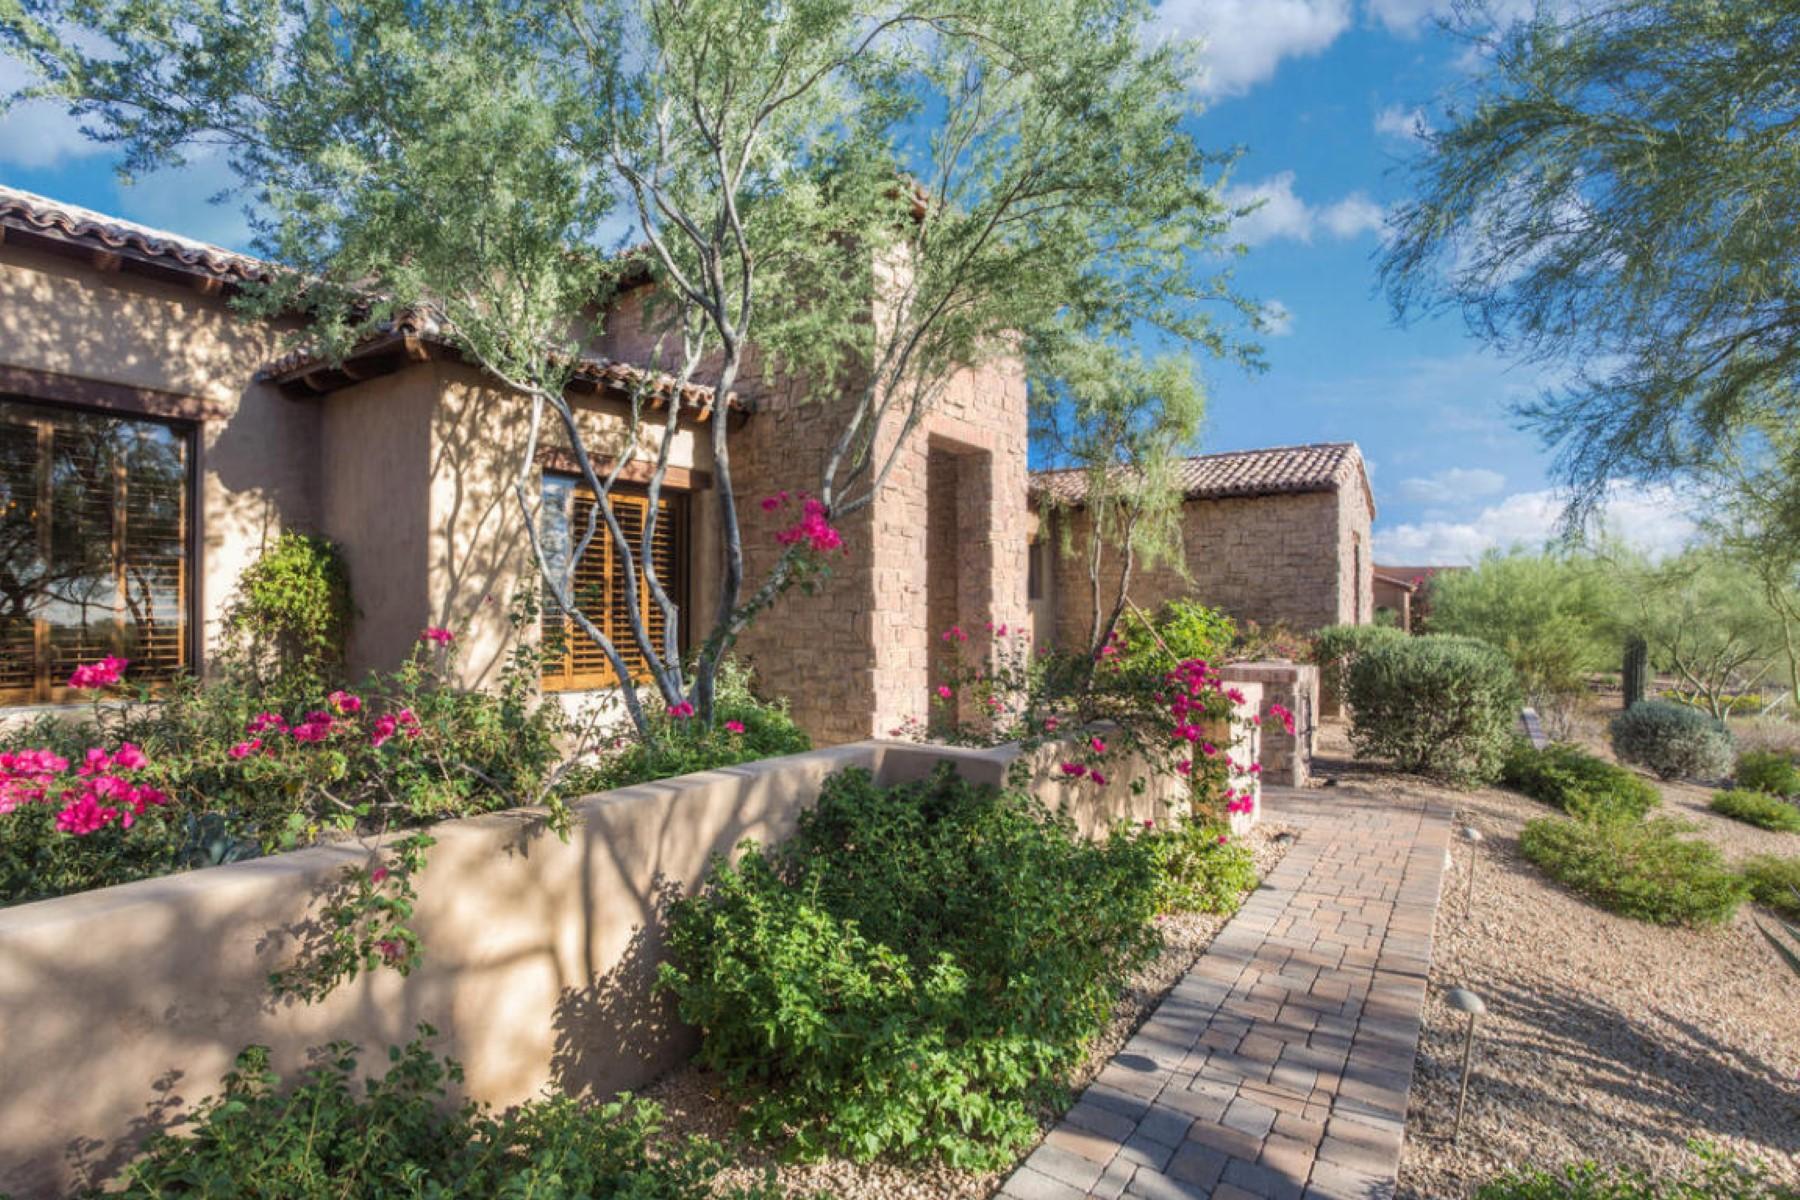 獨棟家庭住宅 為 出售 在 Unique tuscan retreat that opens to a private backyard sanctuary 3461 N Ladera Cir Mesa, 亞利桑那州 85207 美國